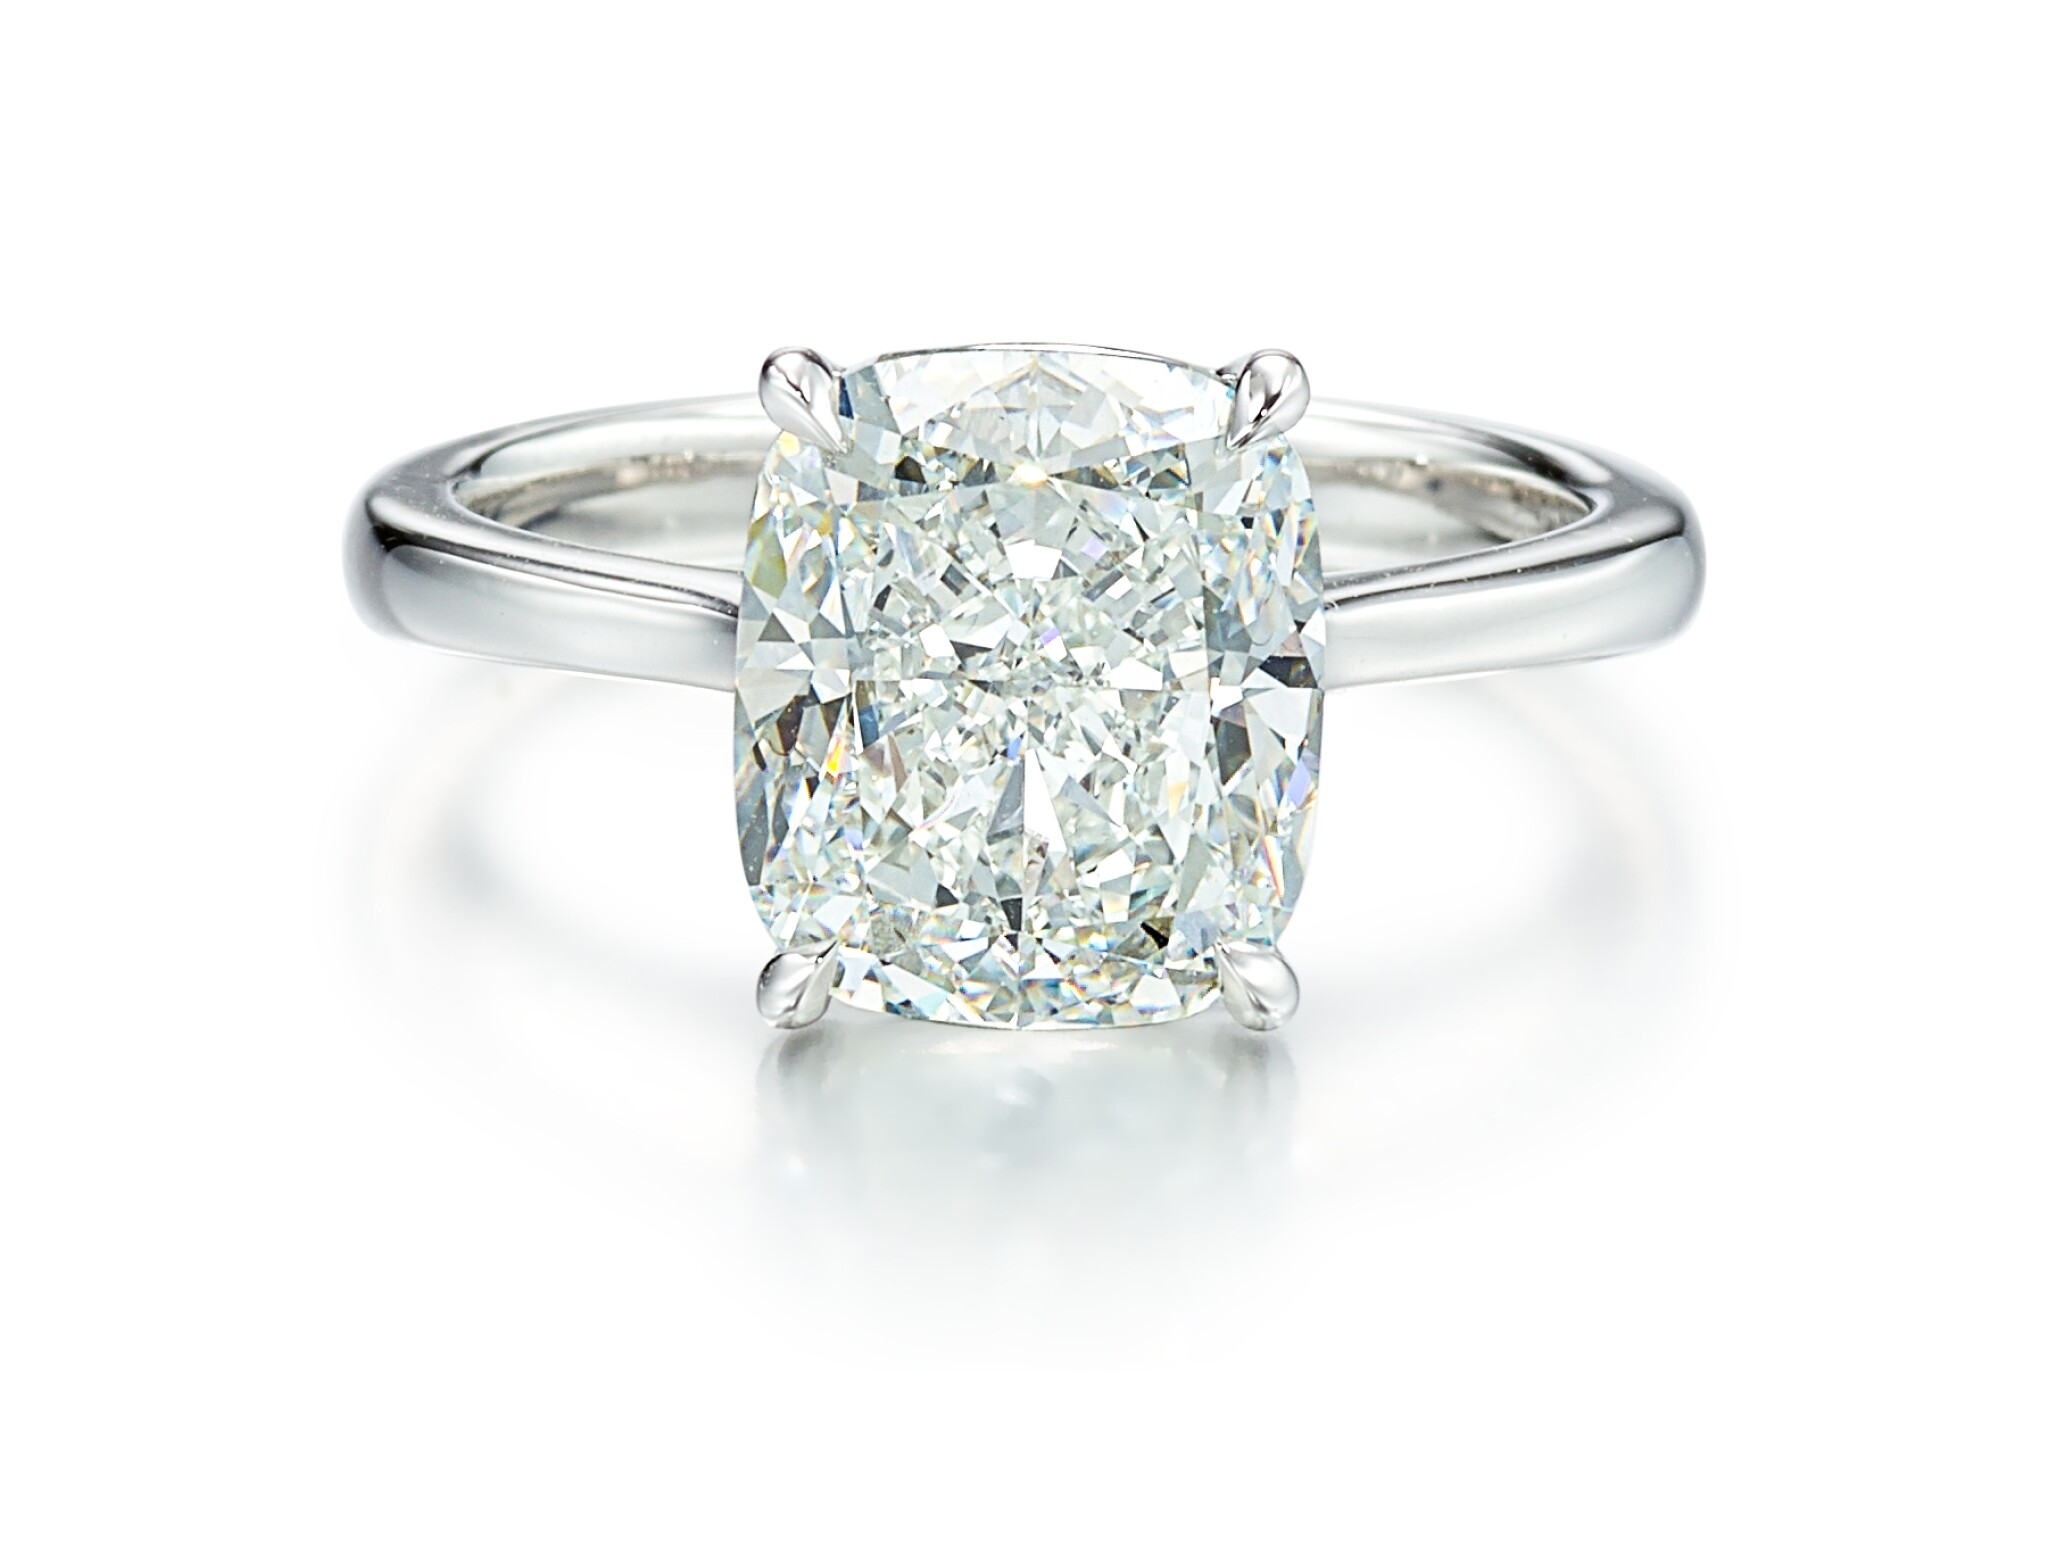 View full screen - View 1 of Lot 9126. DIAMOND RING   5.01卡拉 古墊形 E色 VVS2淨度 鑚石 戒指.